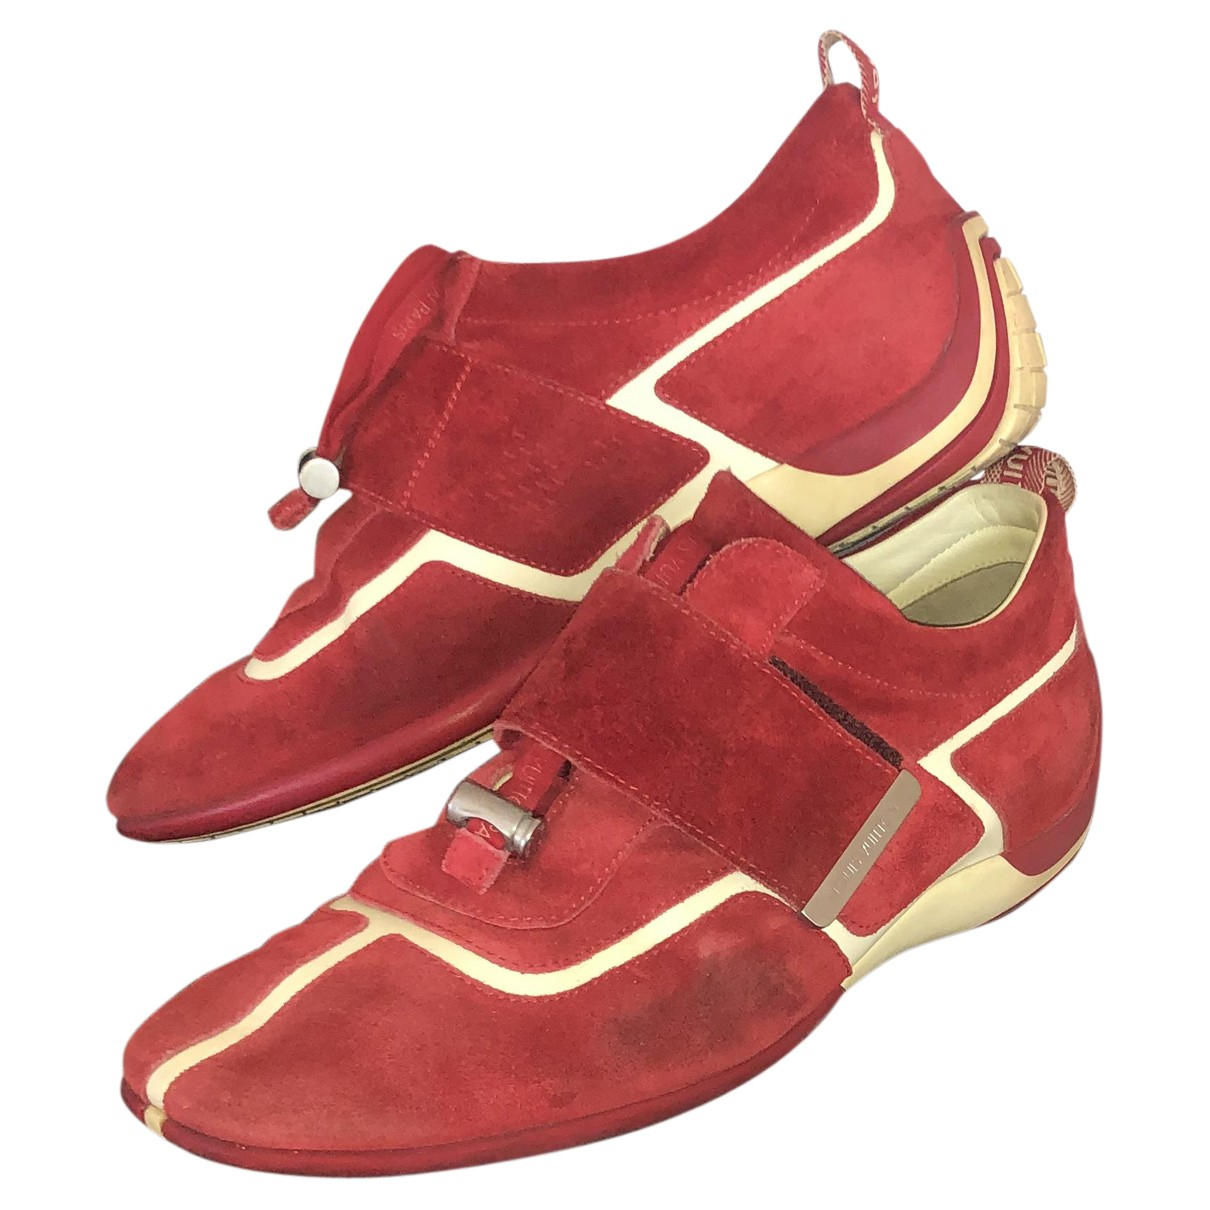 Louis Vuitton N Red Suede Flats for Men 42.5 EU